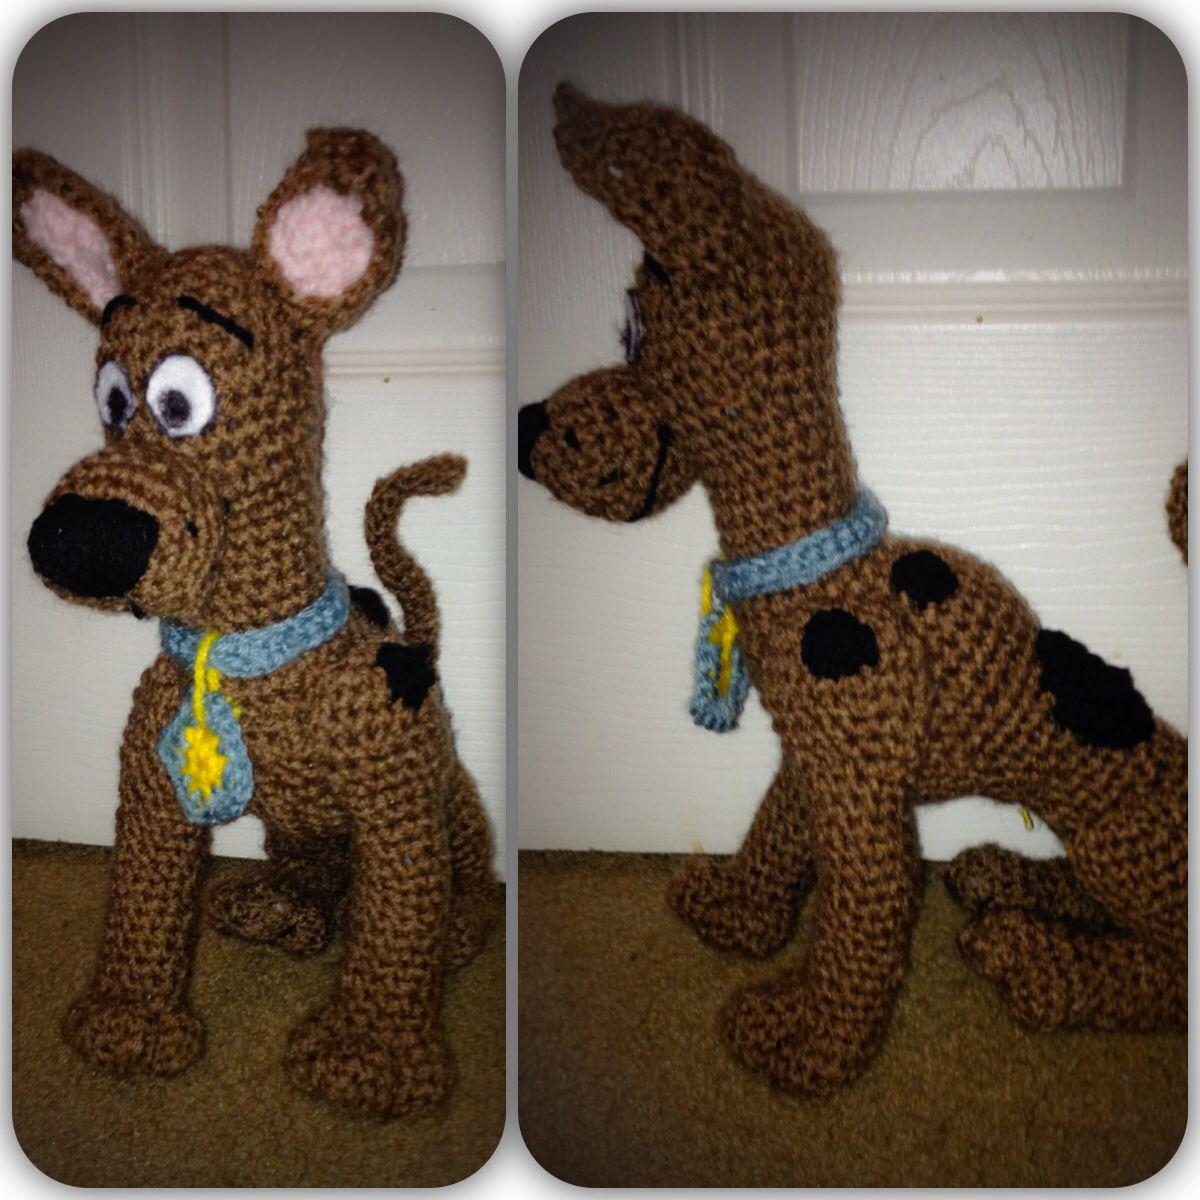 Scooby doo- crochet   Yarn Crafts   Pinterest   Scooby doo ...